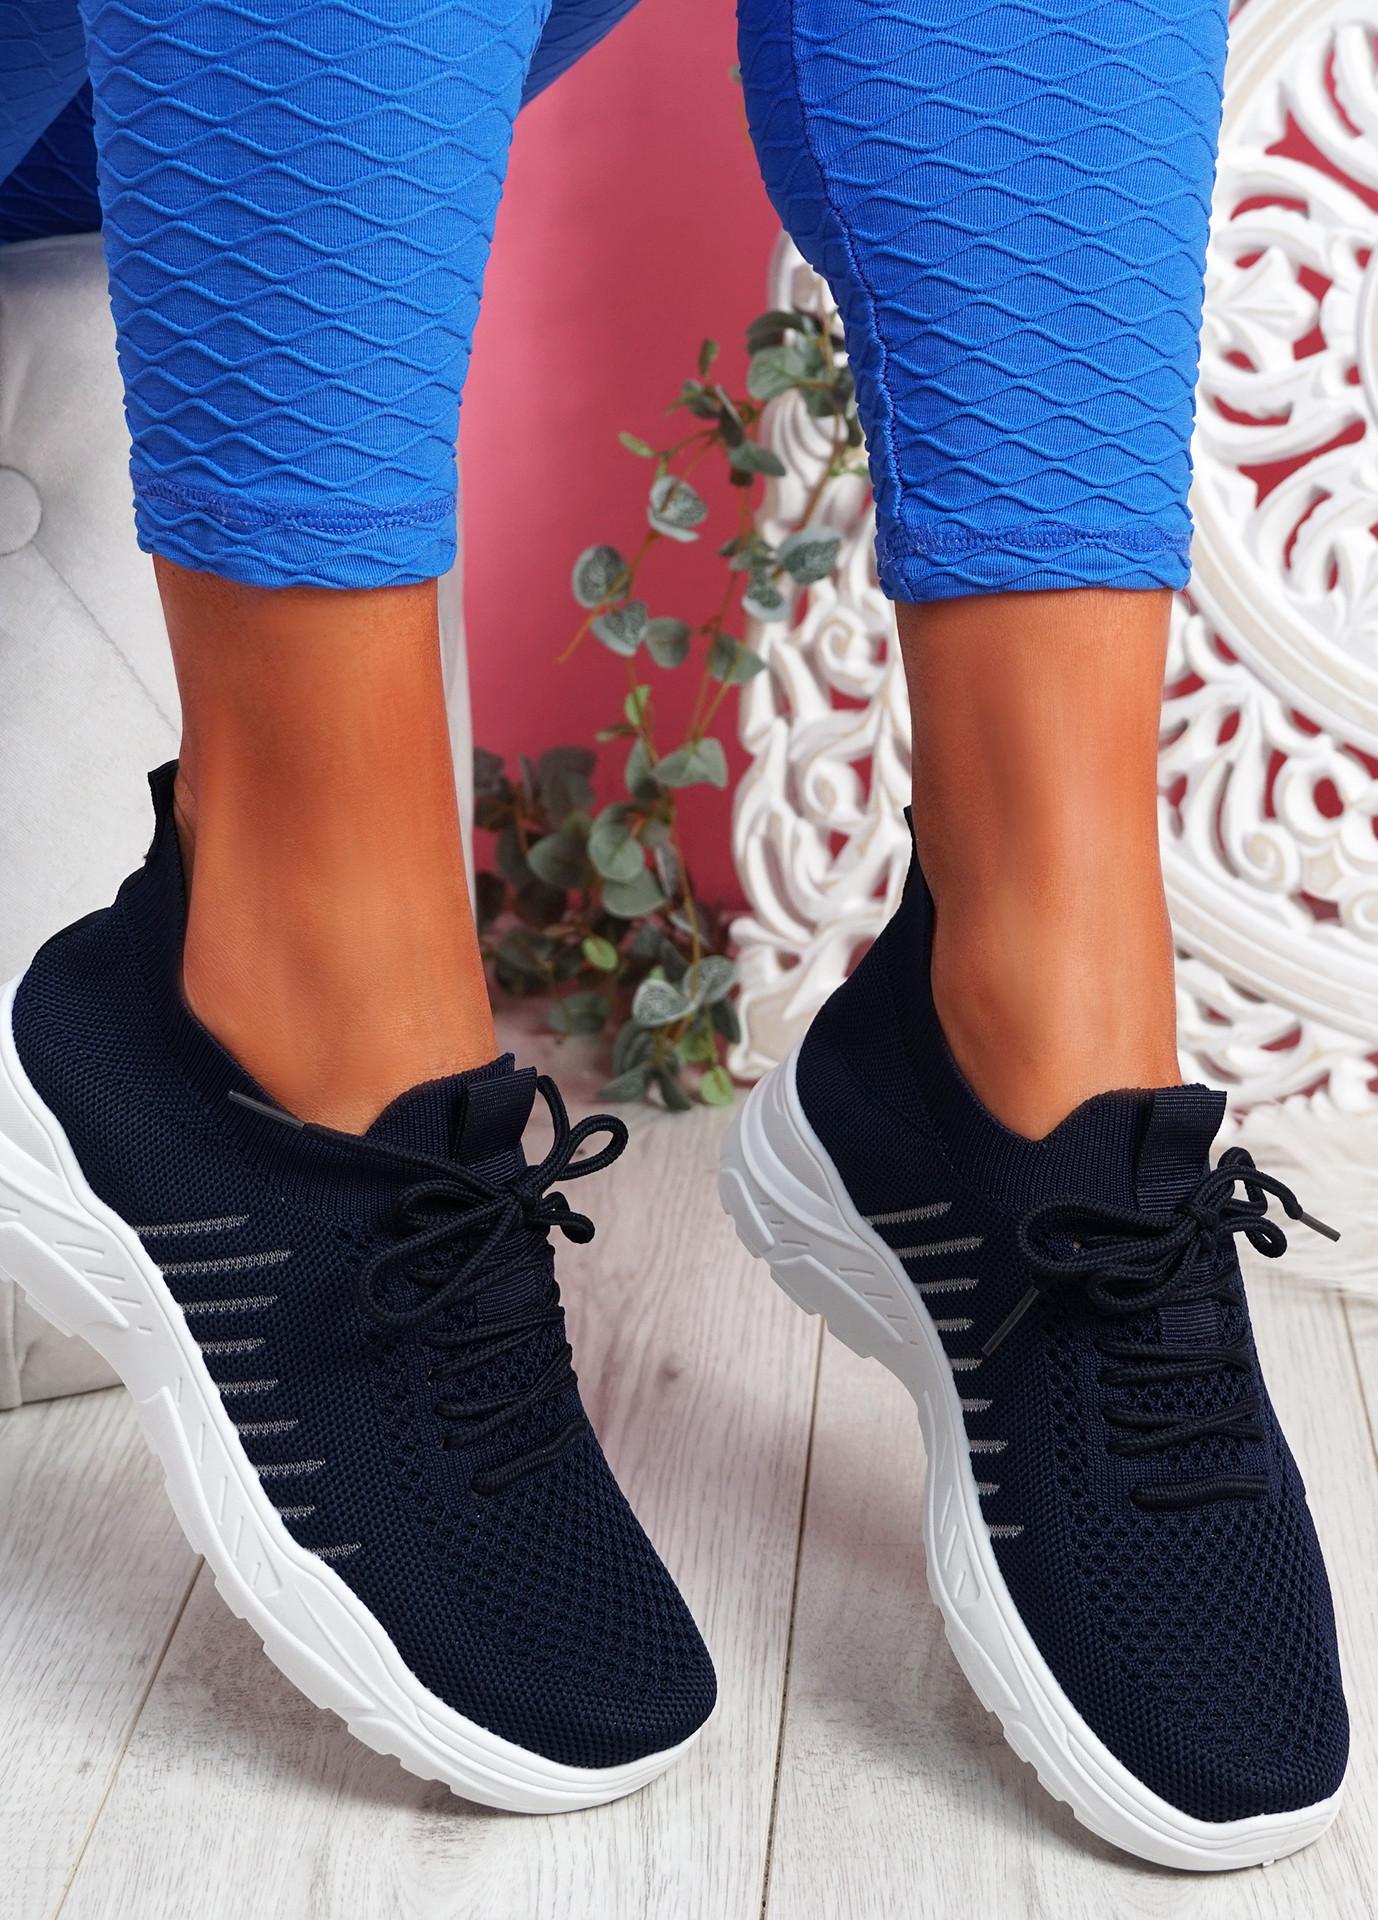 Koda Blue Knit Chunky Sneakers